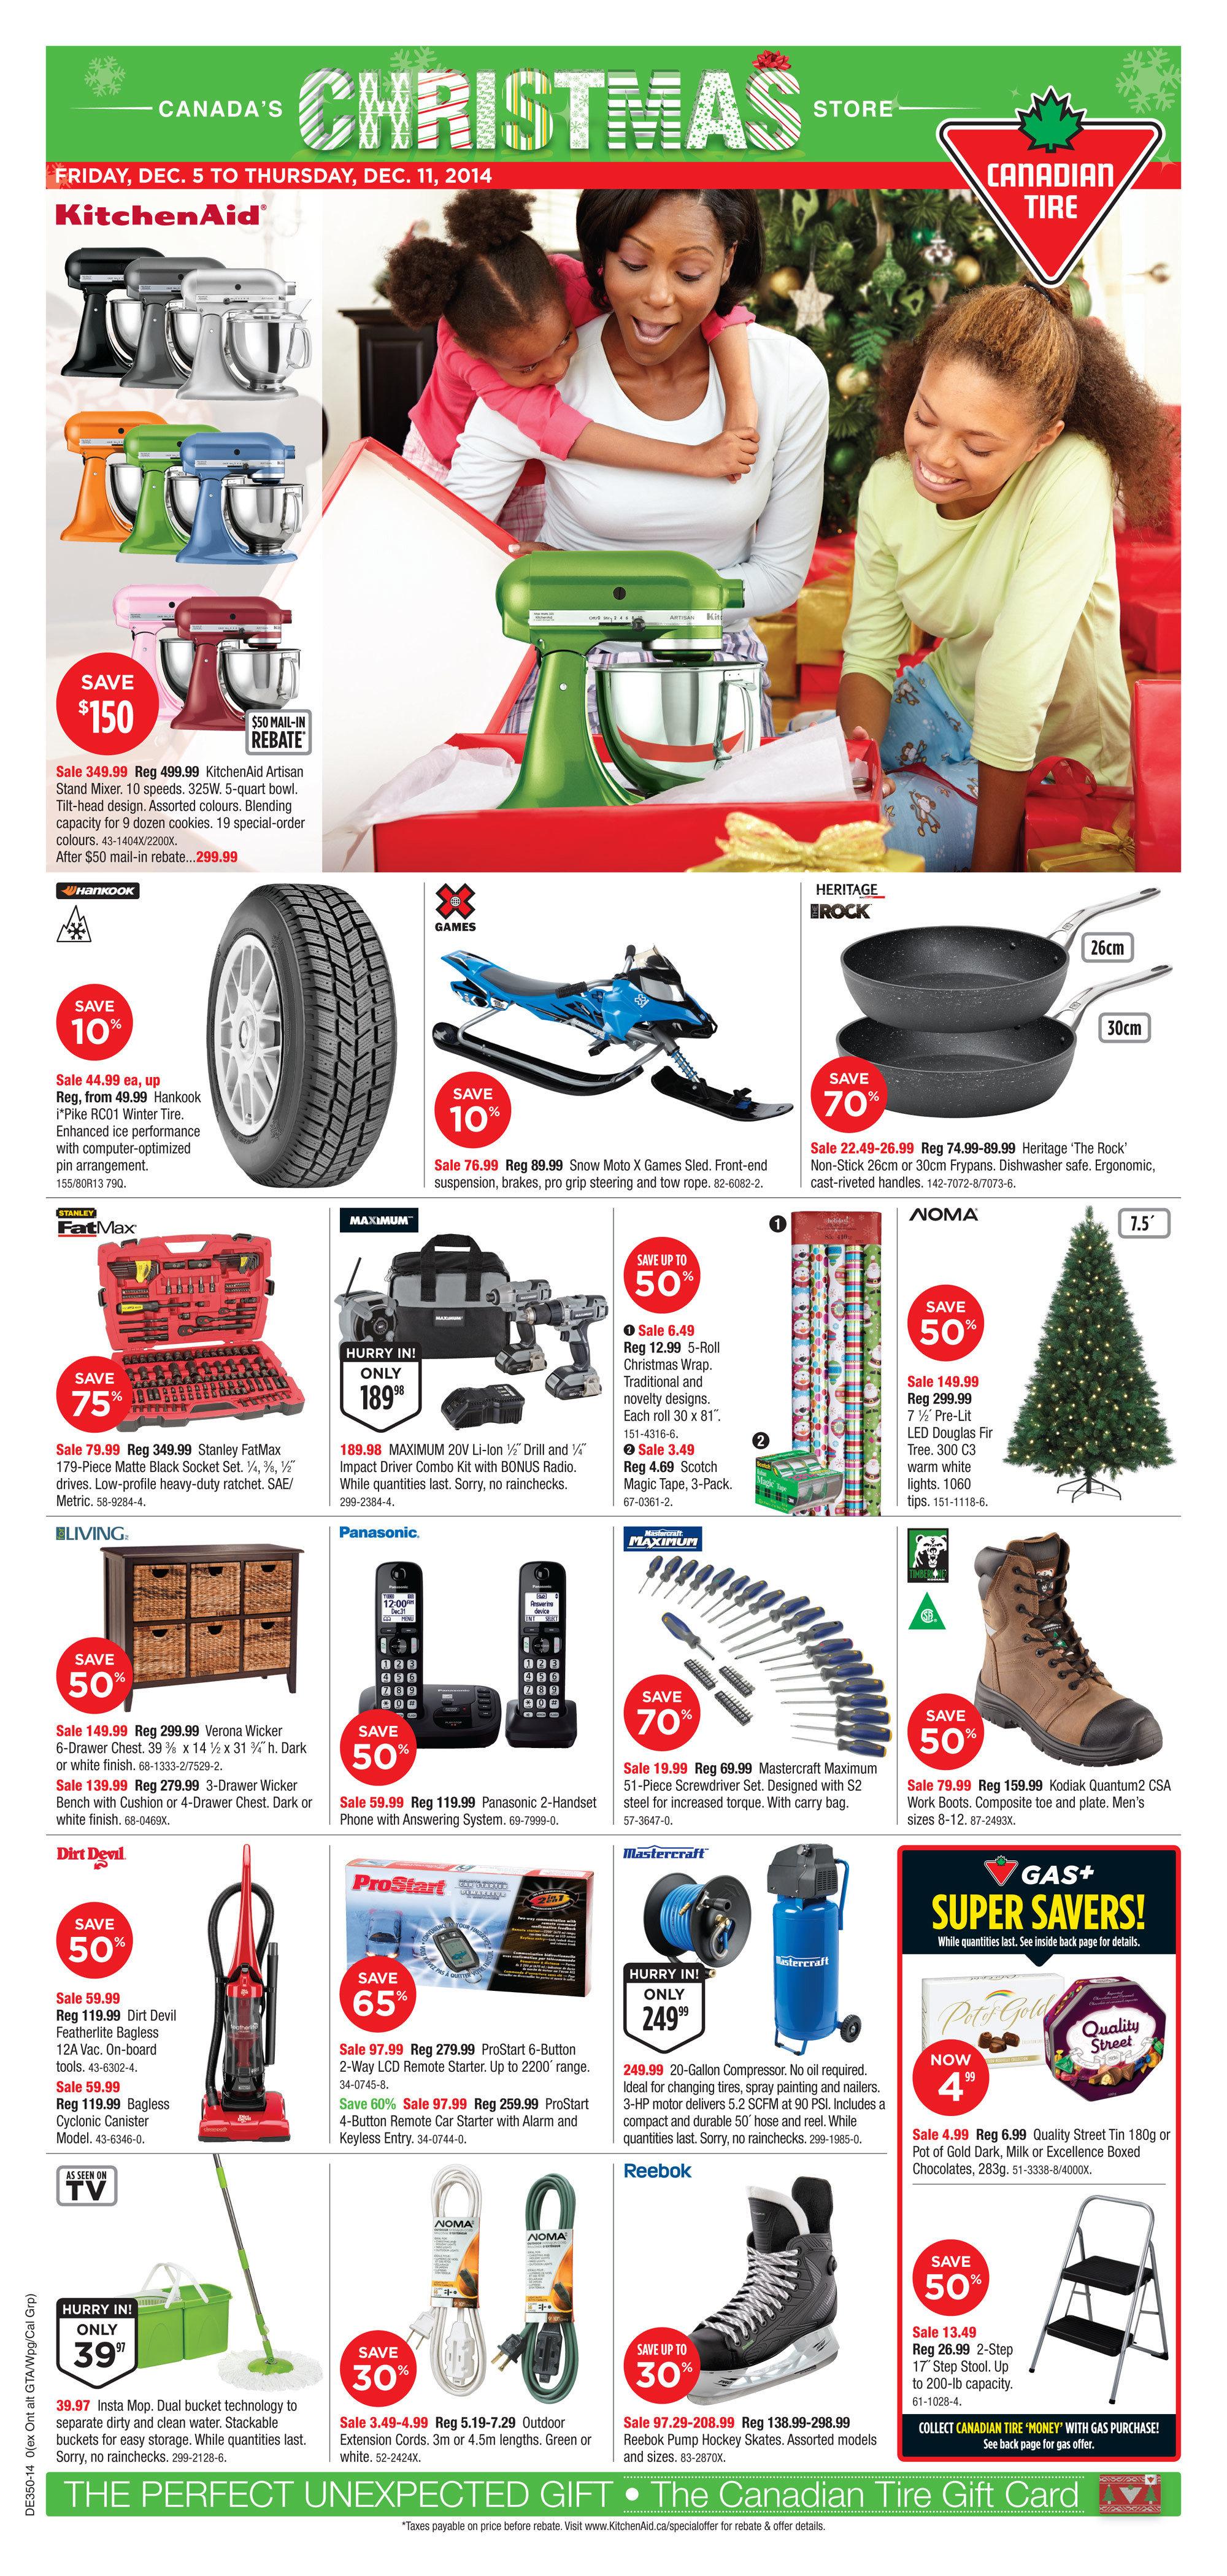 Canadian Tire Weekly Flyer Weekly Flyer Dec 4 11